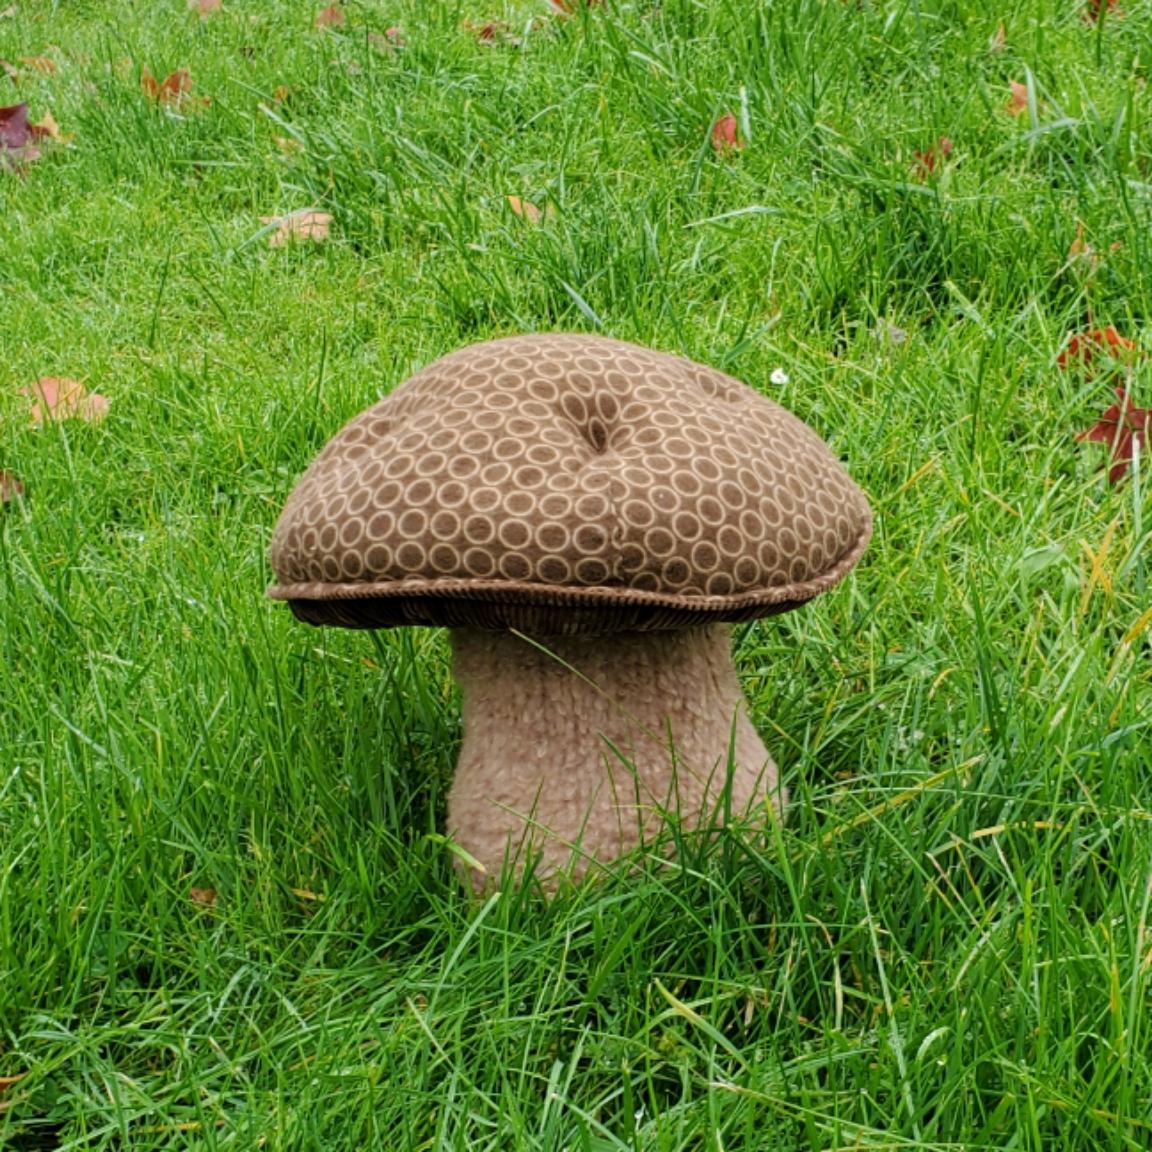 Grassy lawn mushroom brown dotty